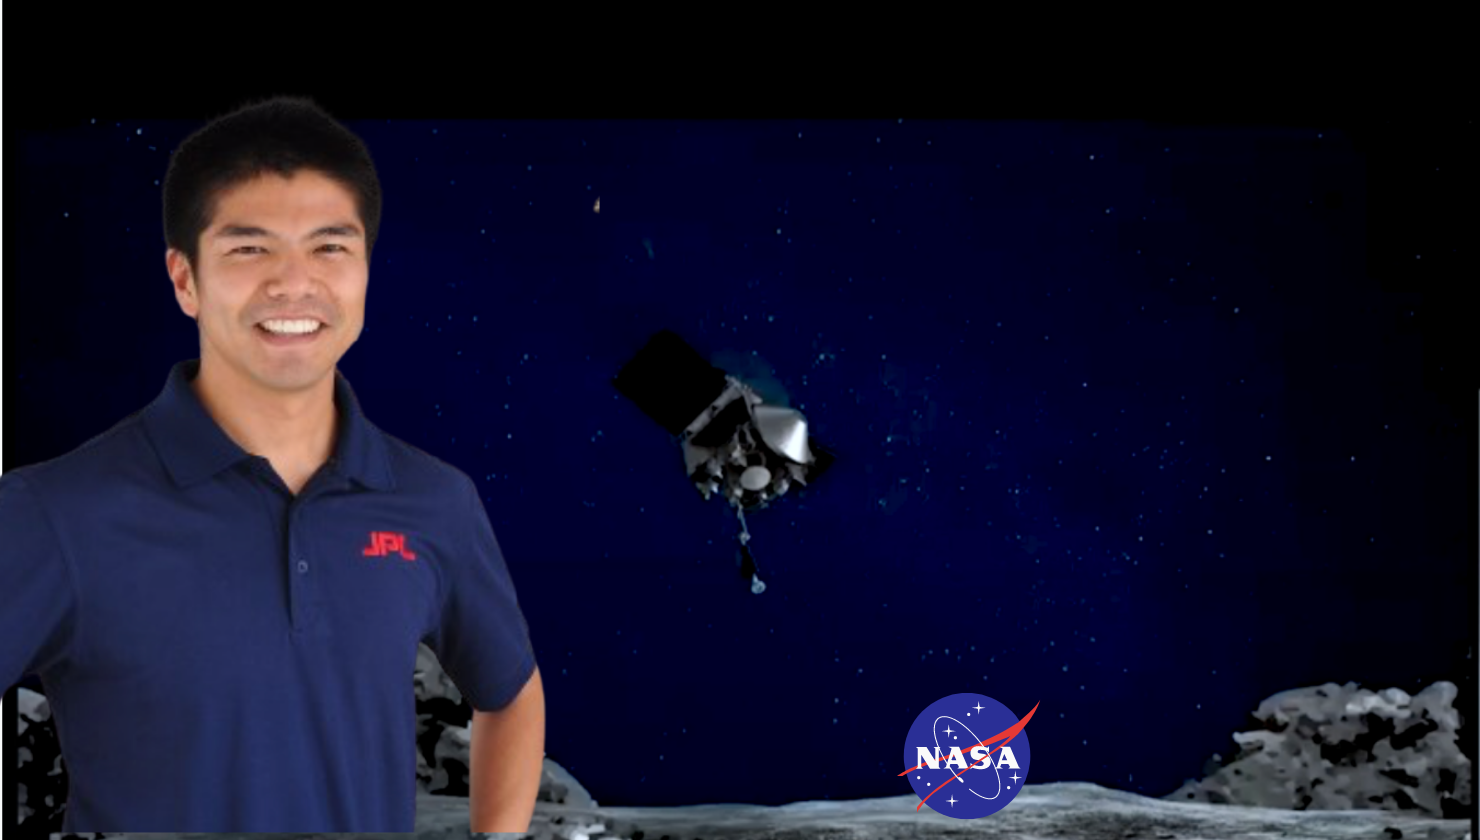 "<p>NASA SPACECRAFT NAVIGATOR</p><p><span class=""text-xs"">DR. YU TAKAHASHI</span></p><p></p>"